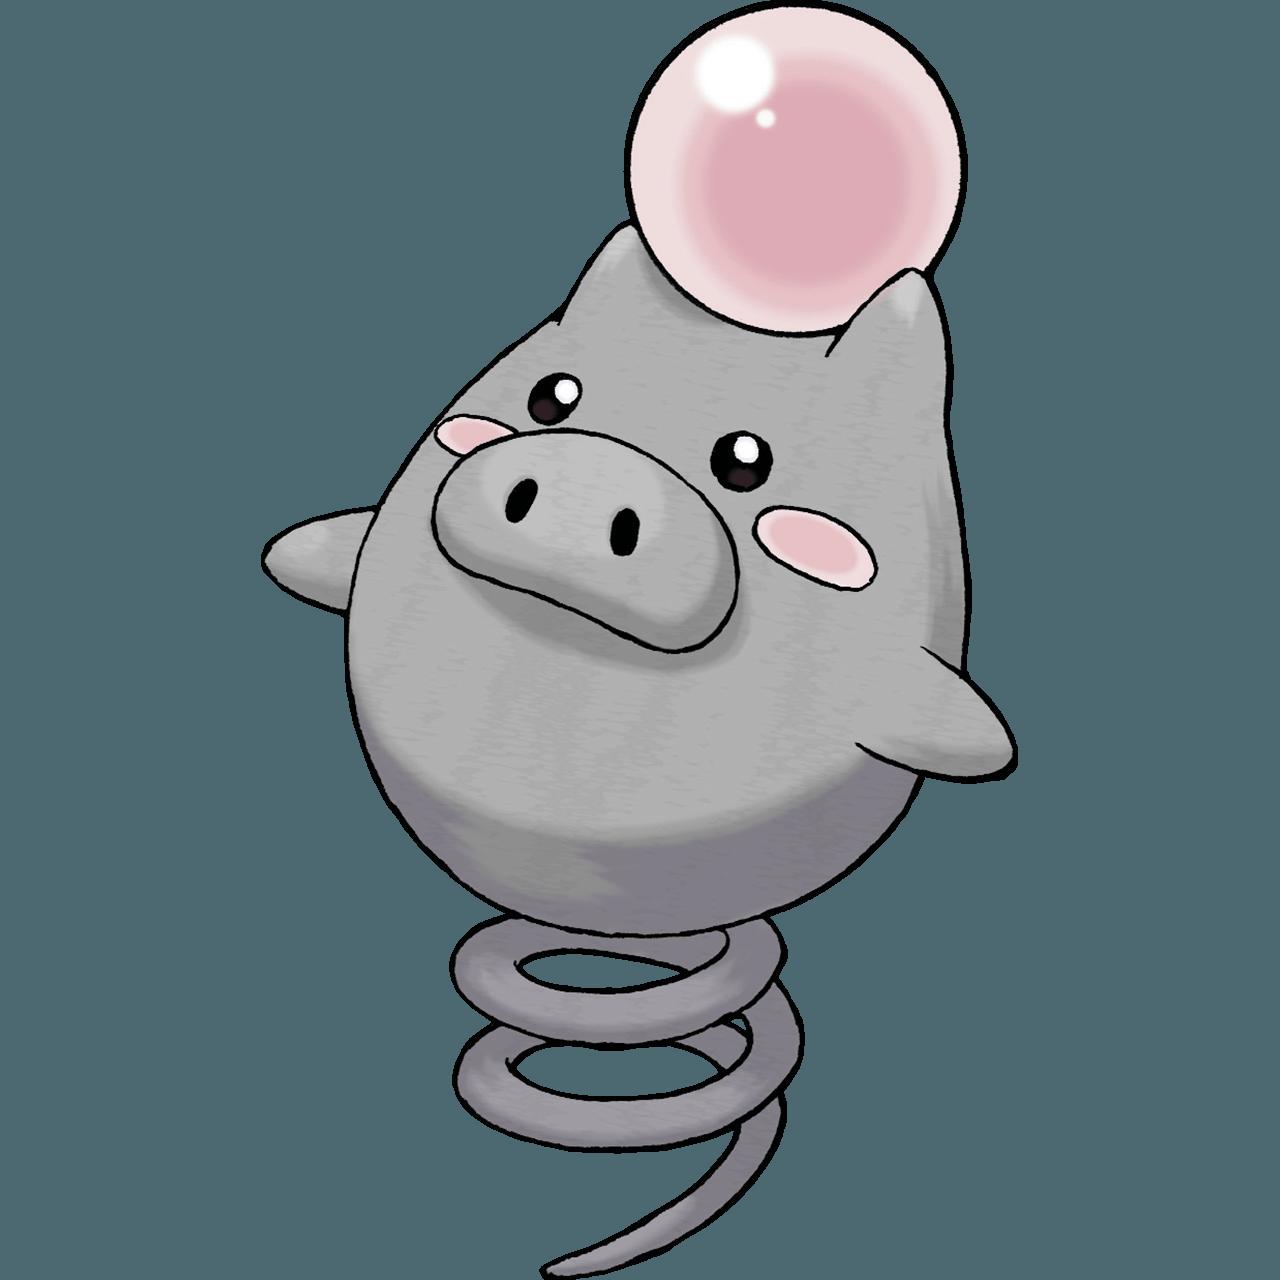 Spoink | Pokemon GO Wiki - GamePress